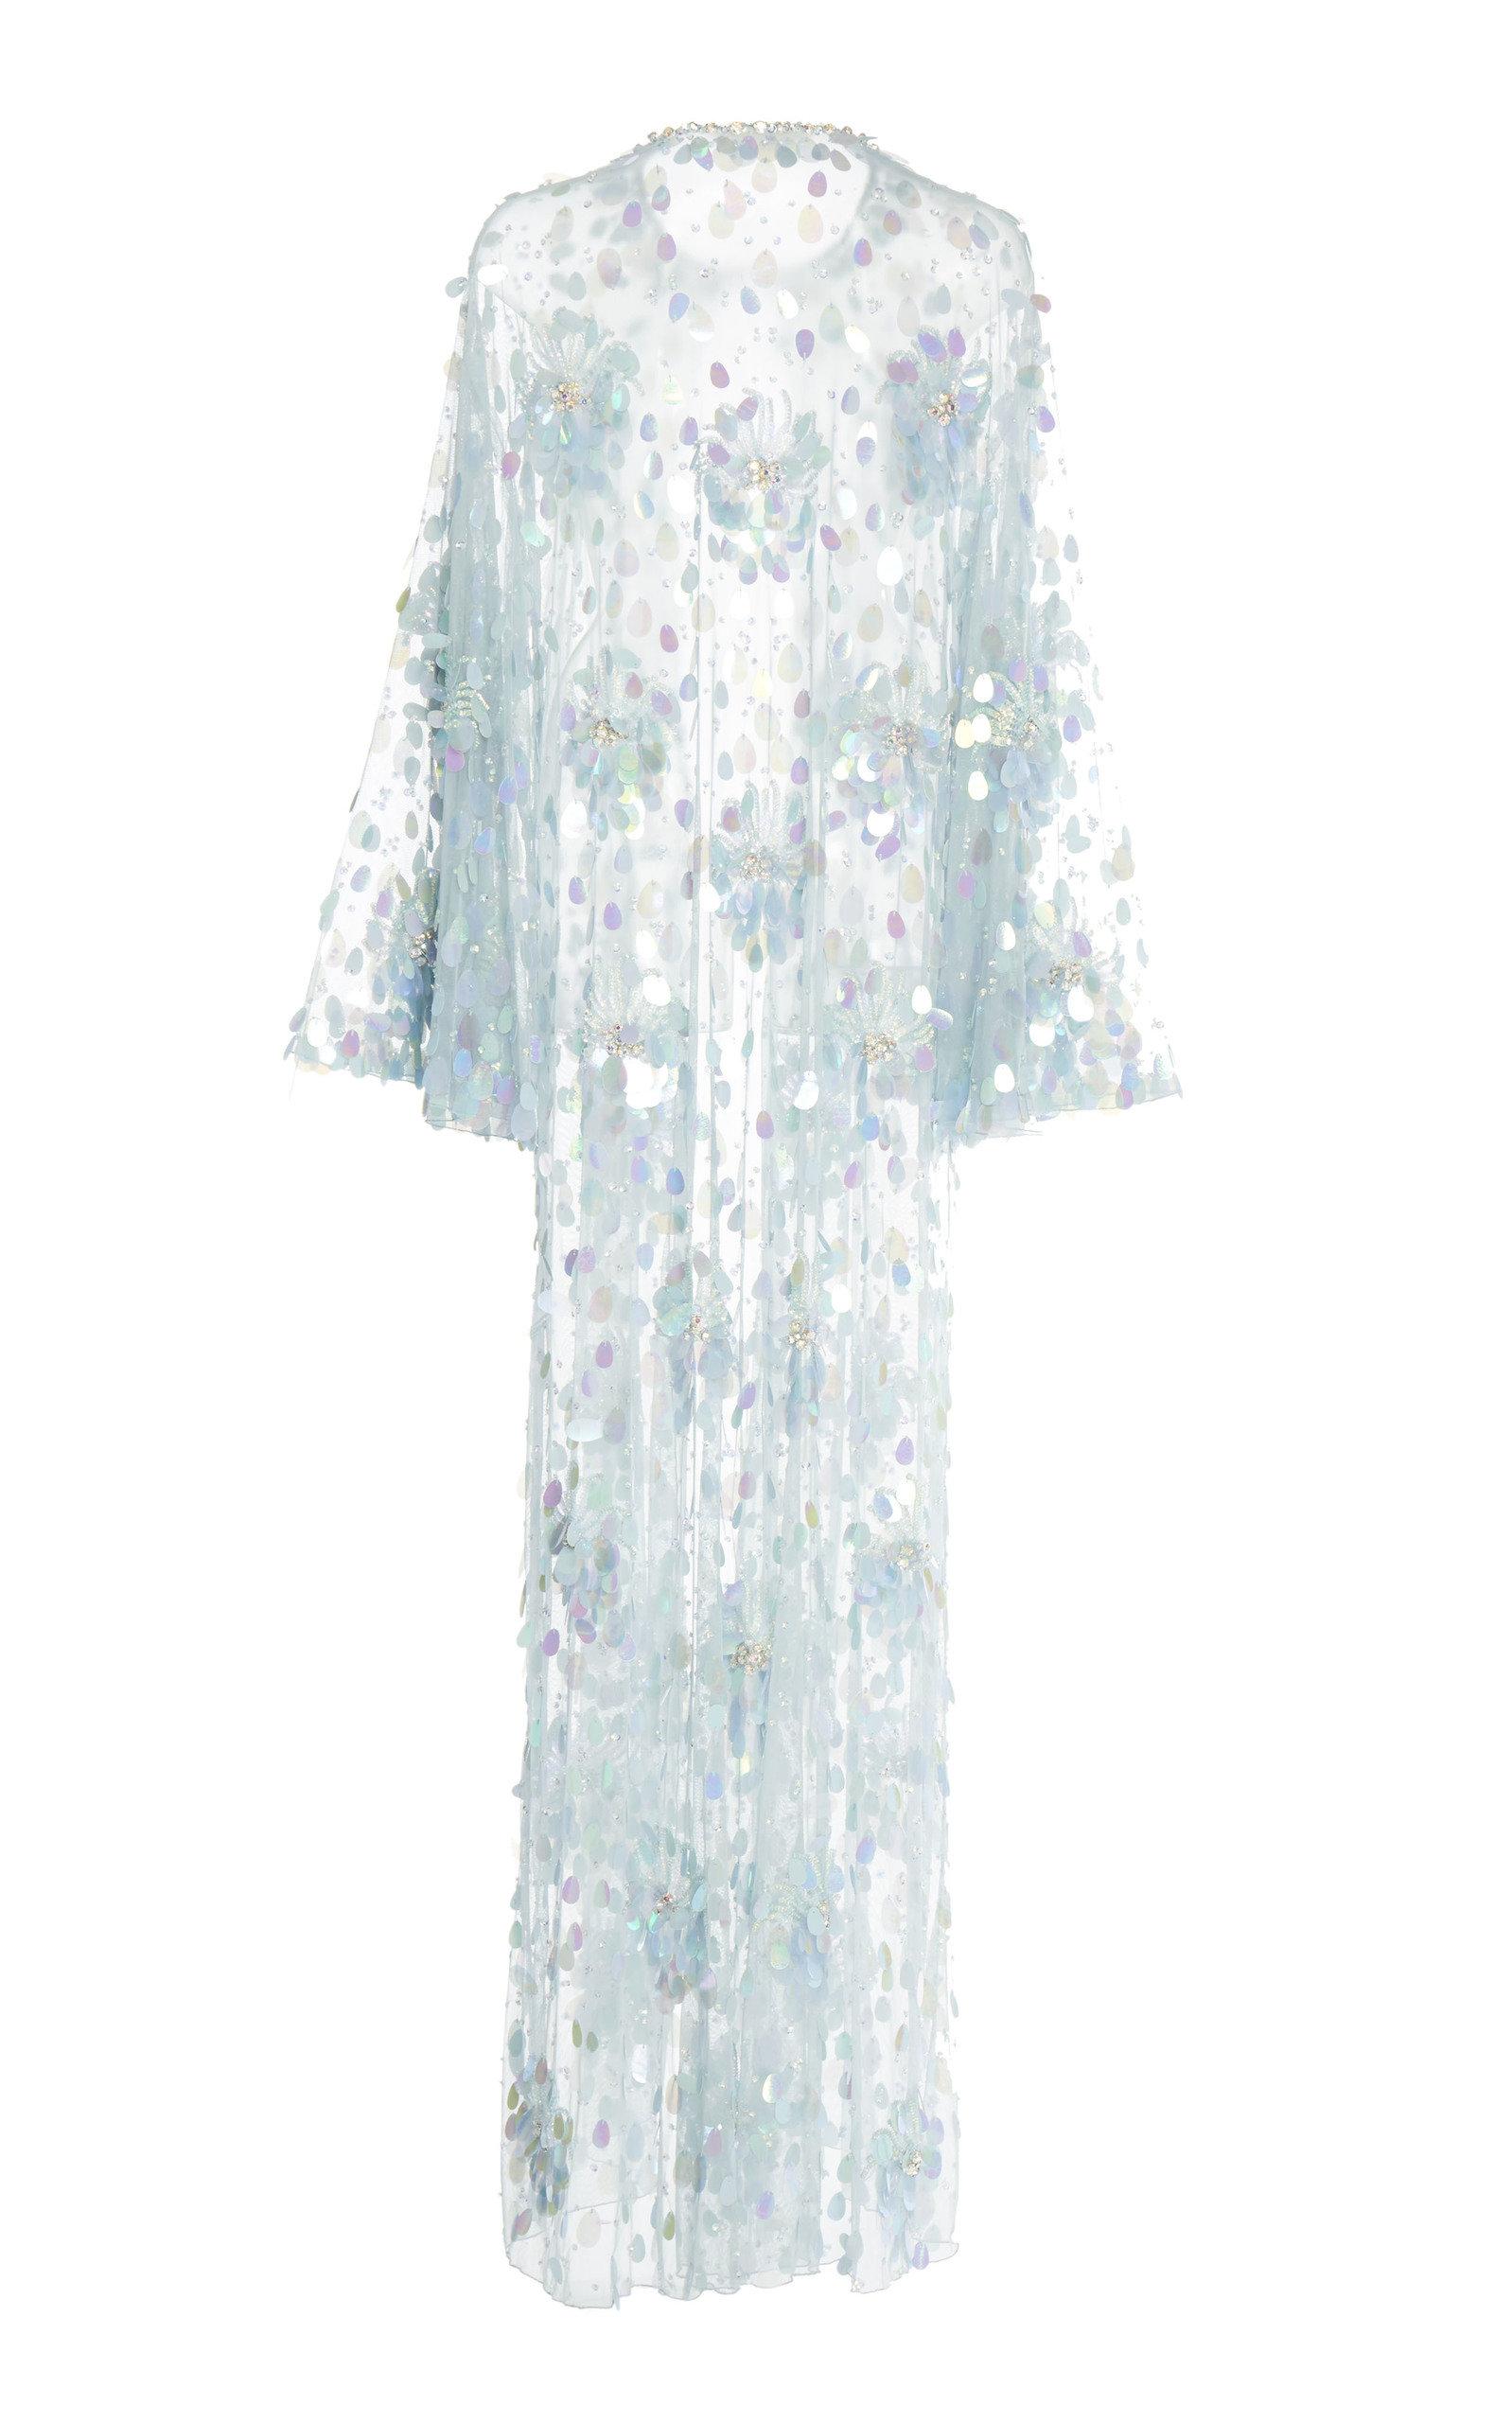 Almandine Sequin Coat Jenny Packham Clearance Cheap Find Great Huge Surprise Wholesale Price Cheap Online Cost For Sale Hu8tnjI1ex